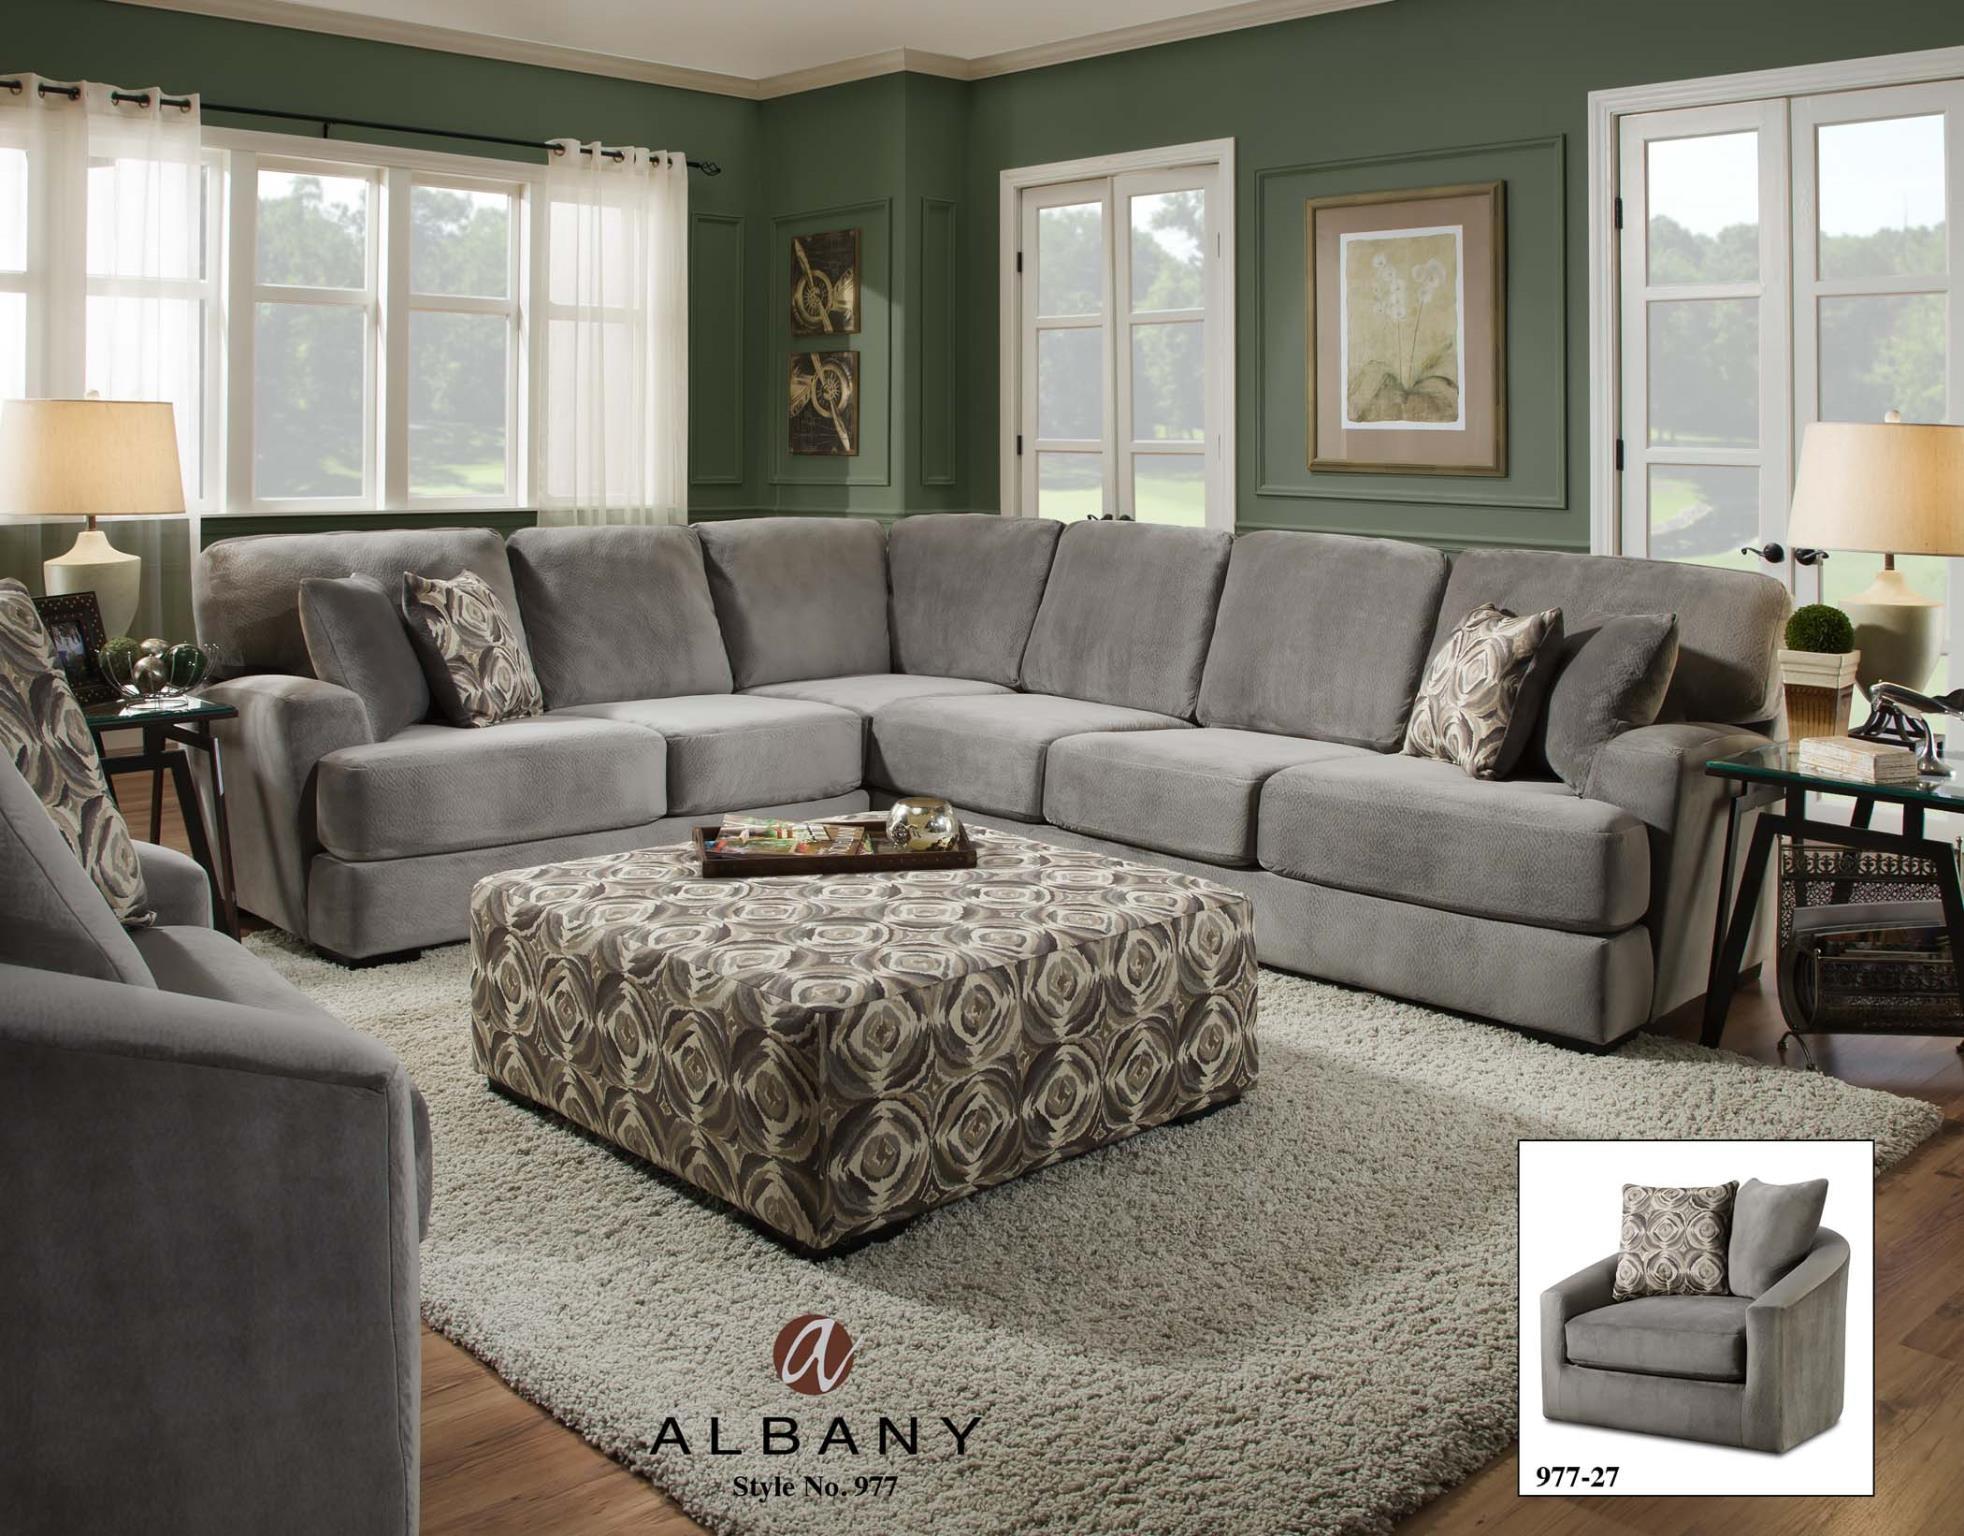 Captivating Albany Living Room SWIVEL CHAIR 977 27 At Feceras Furniture U0026 Mattress